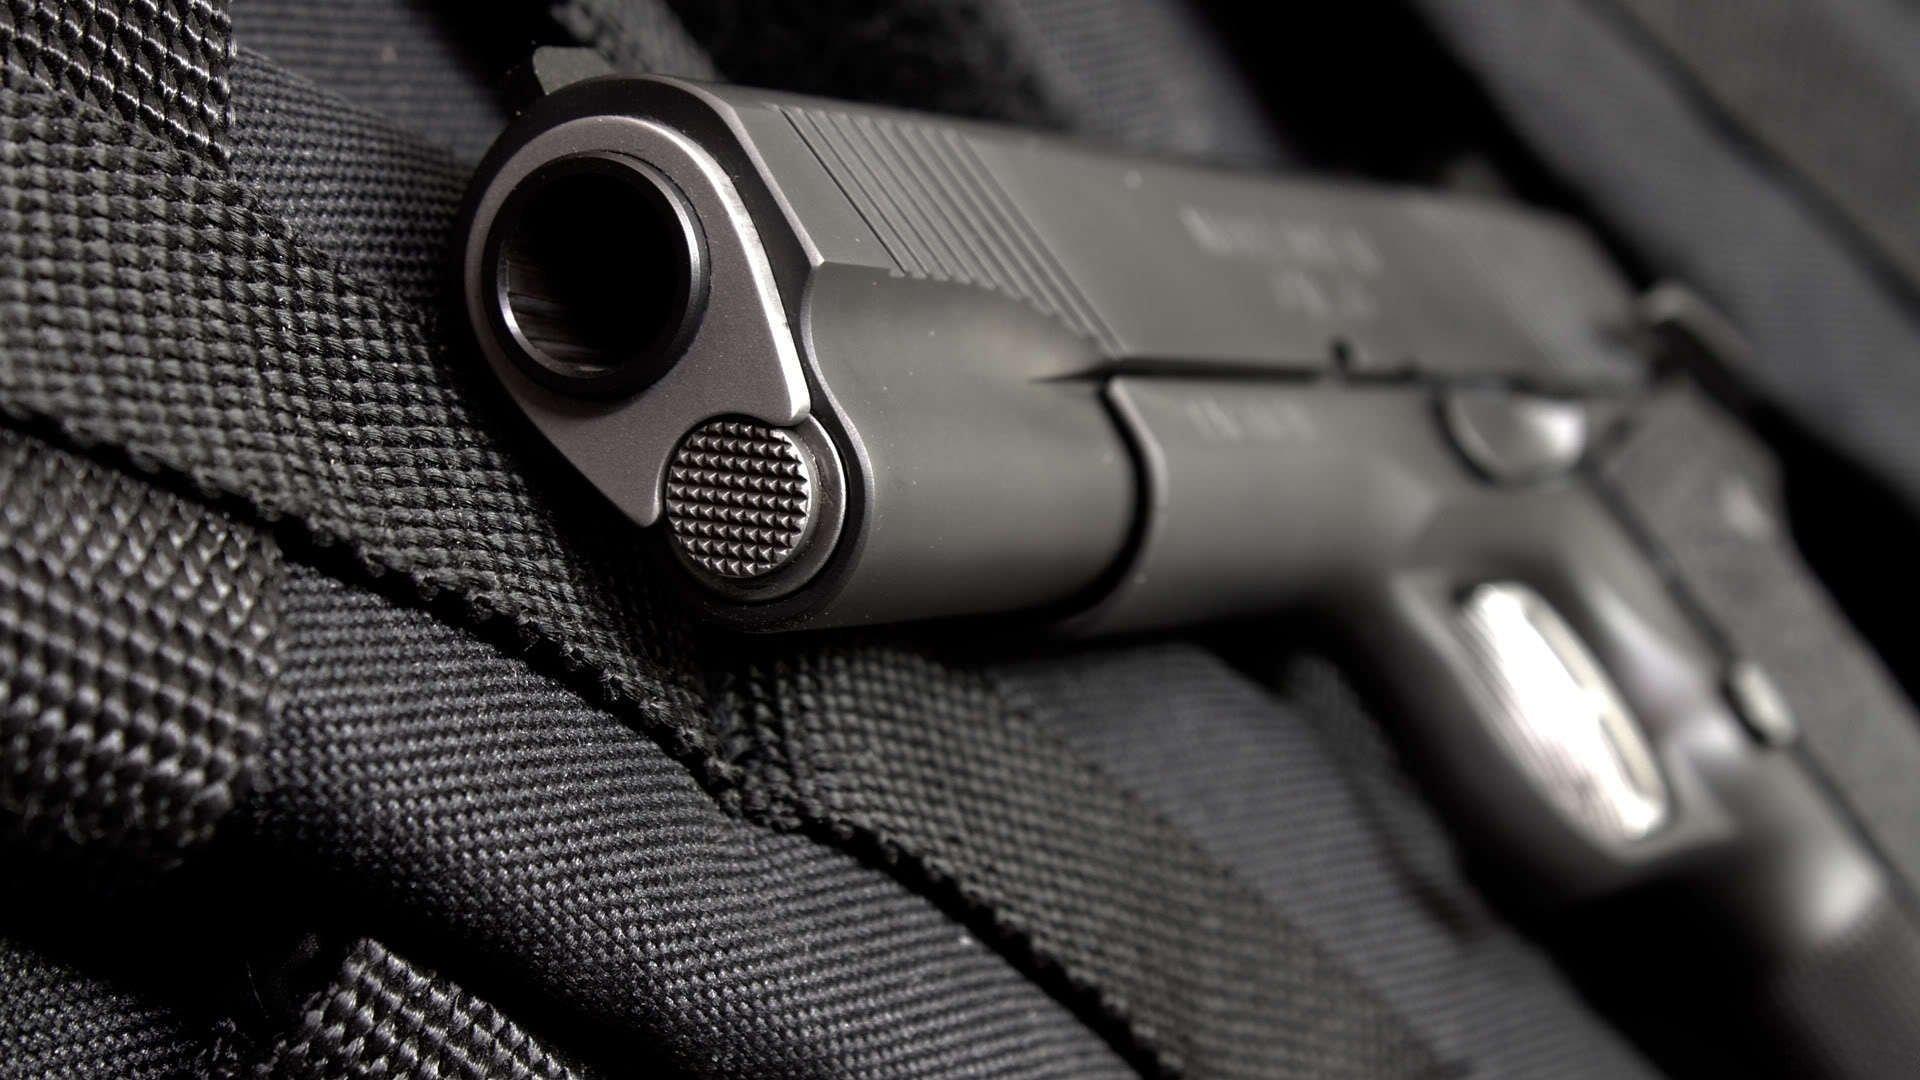 Hd wallpaper gun - Hd Wallpaper Background Id 221919